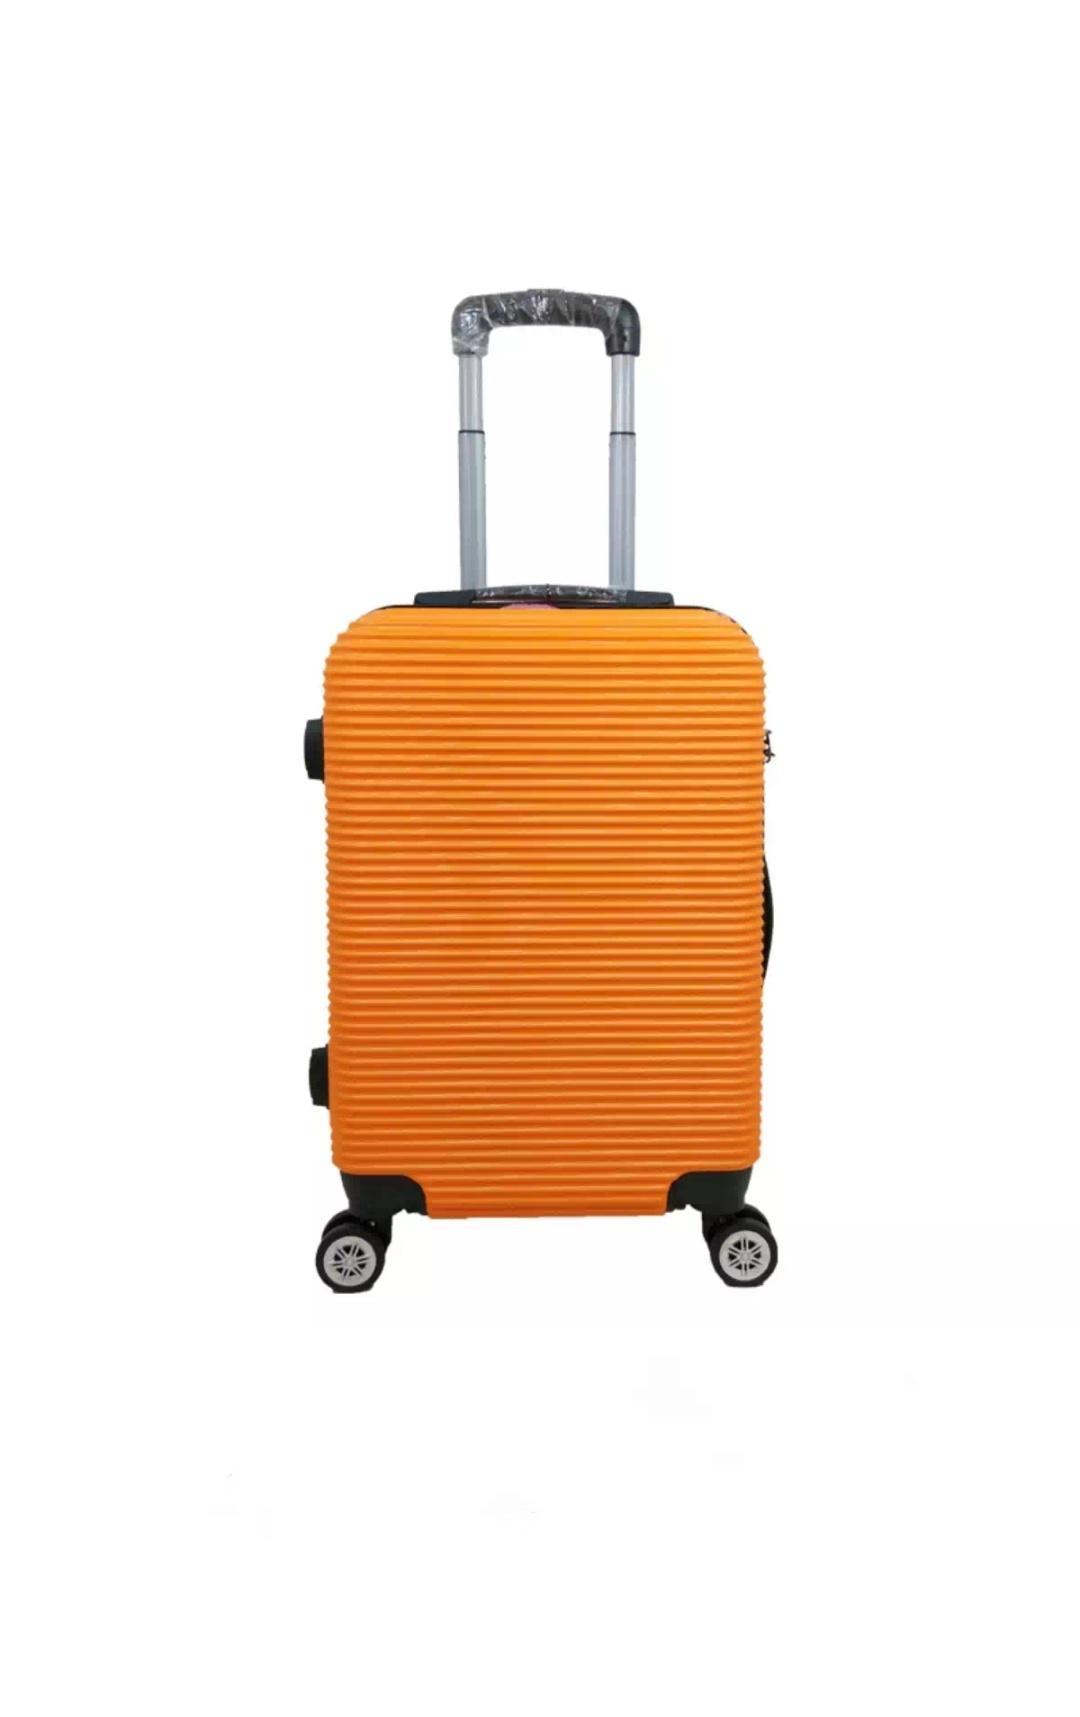 Koper Polo Love Fiber Hardchase 20inch waterproof Original-Orange